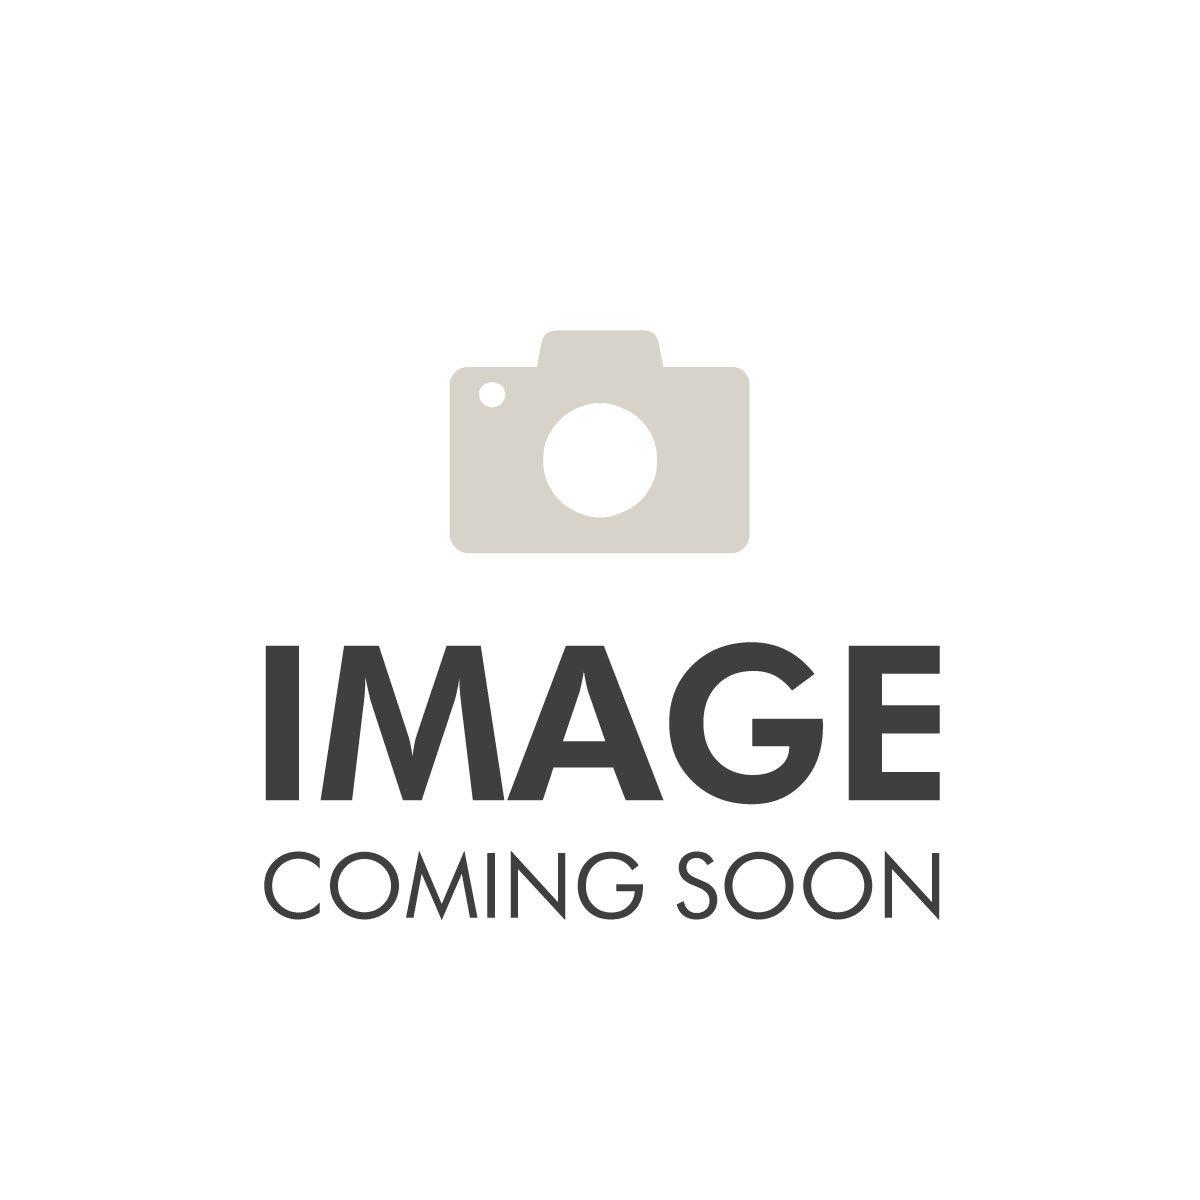 Olaplex Stand Alone Stylist Single Use Treatment Kit- Step 1 Bond